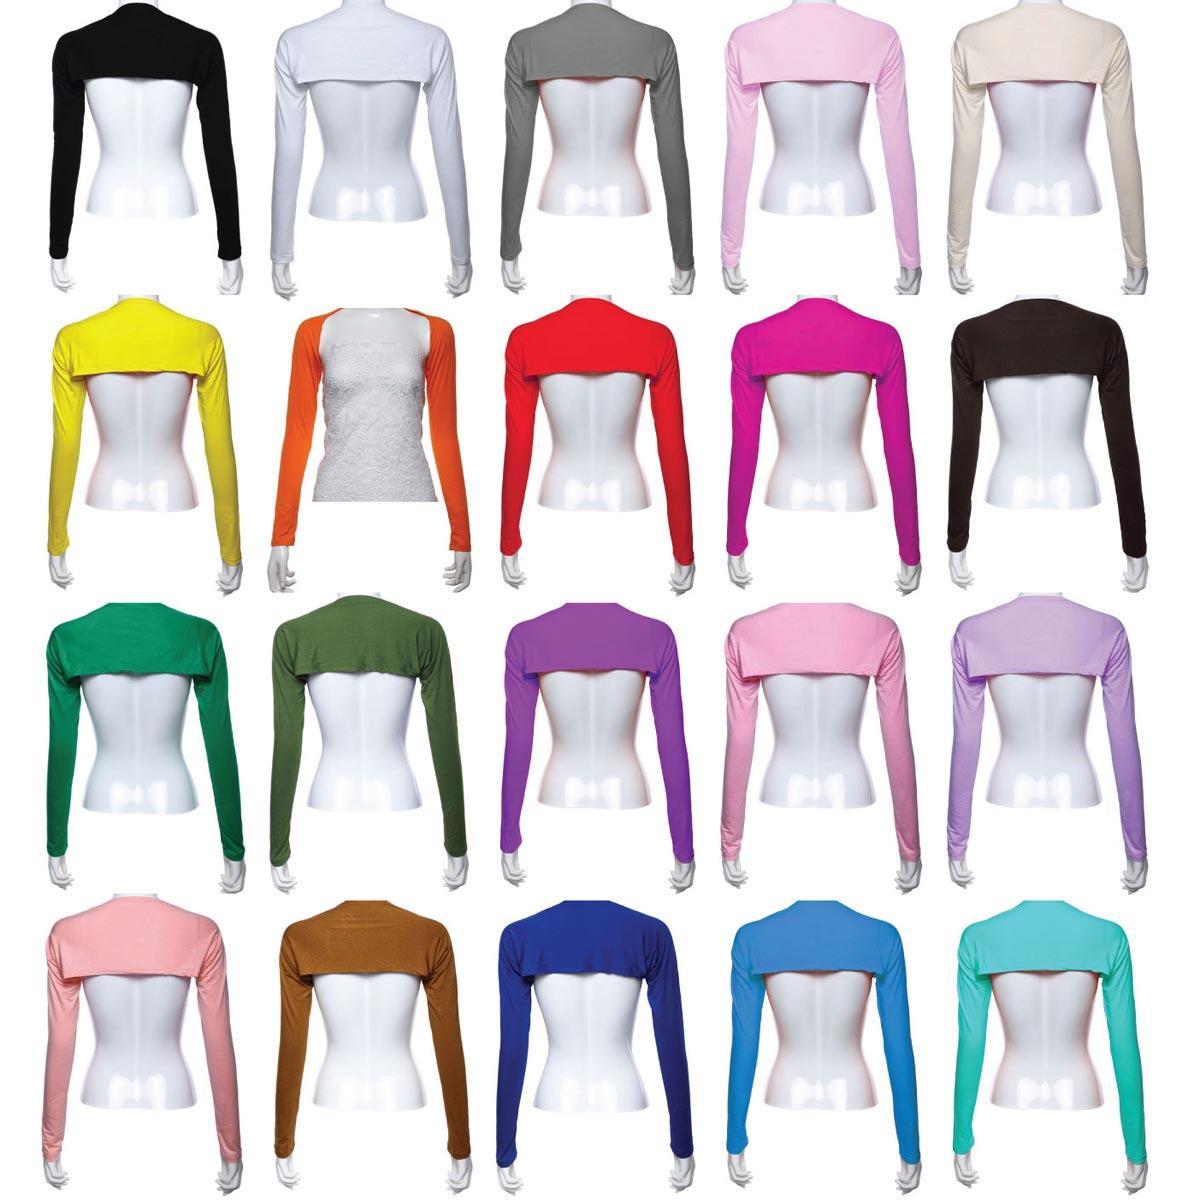 12PCS Ramadan Women Clothes Muslim One Piece Protection Sleeves Arm Cover Shrug Bolero Hayaa Islamic Fashion Random Color